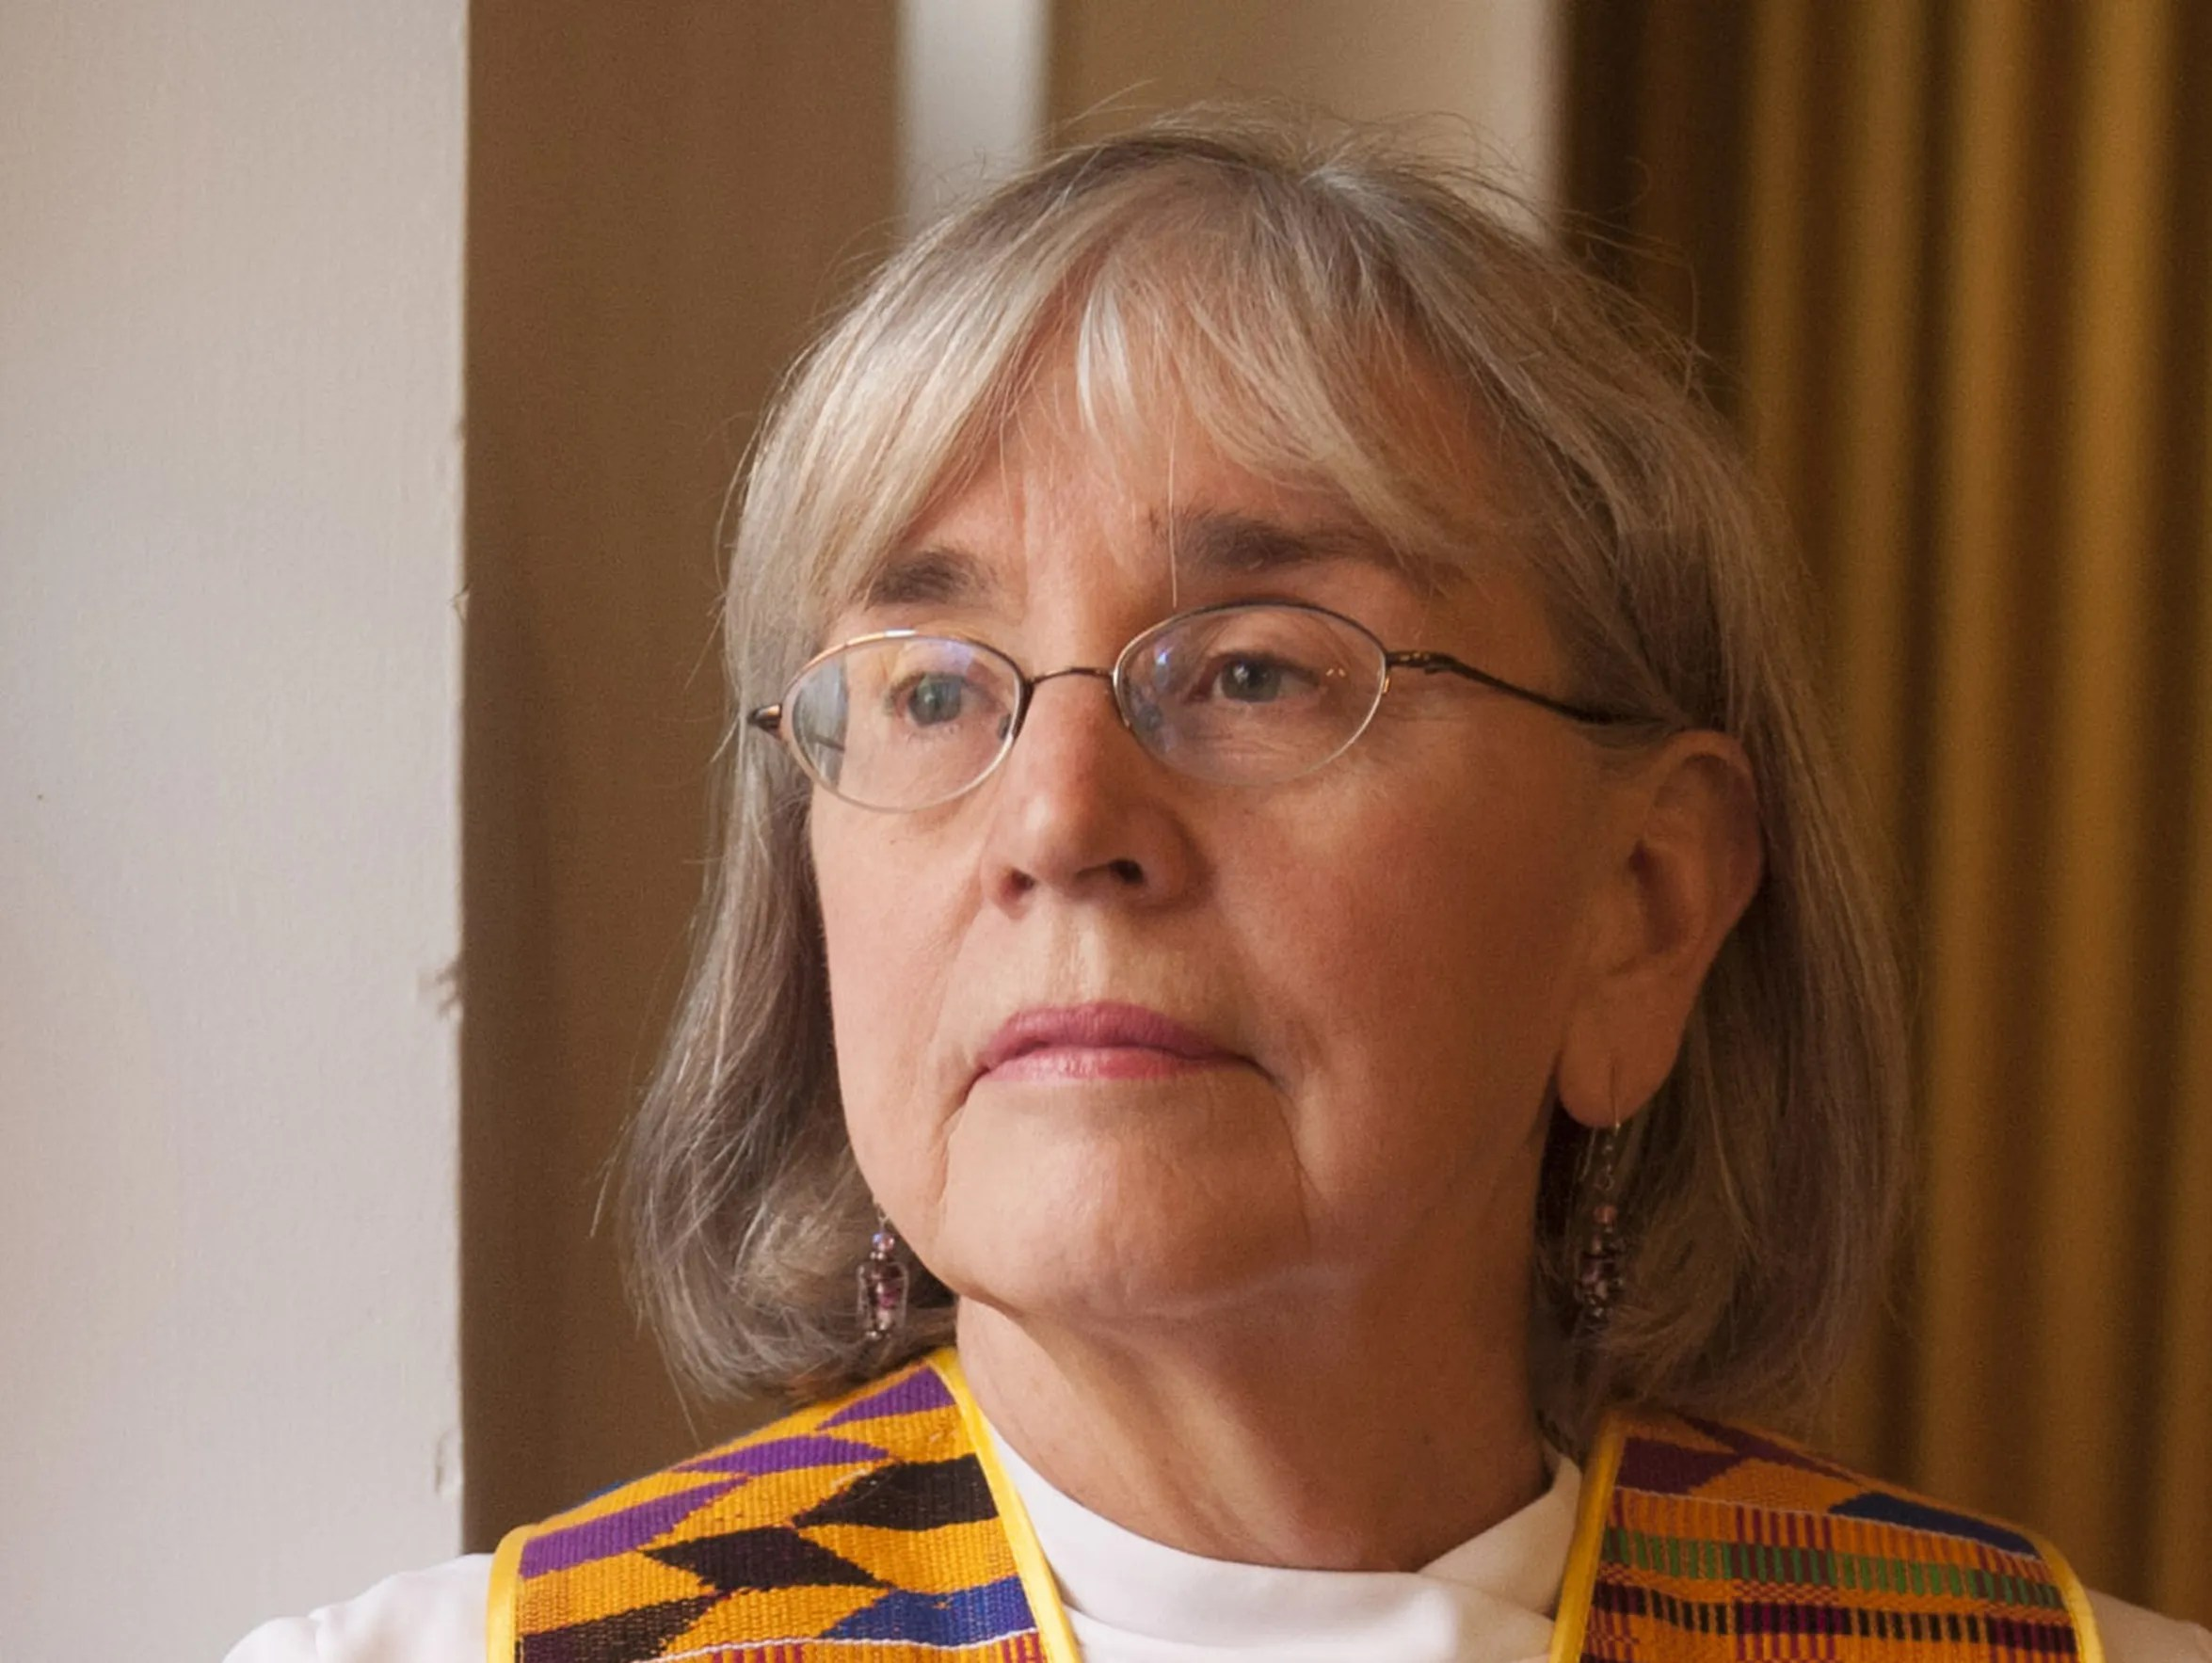 Eileen DiFranco calls herself a Roman Catholic priest,